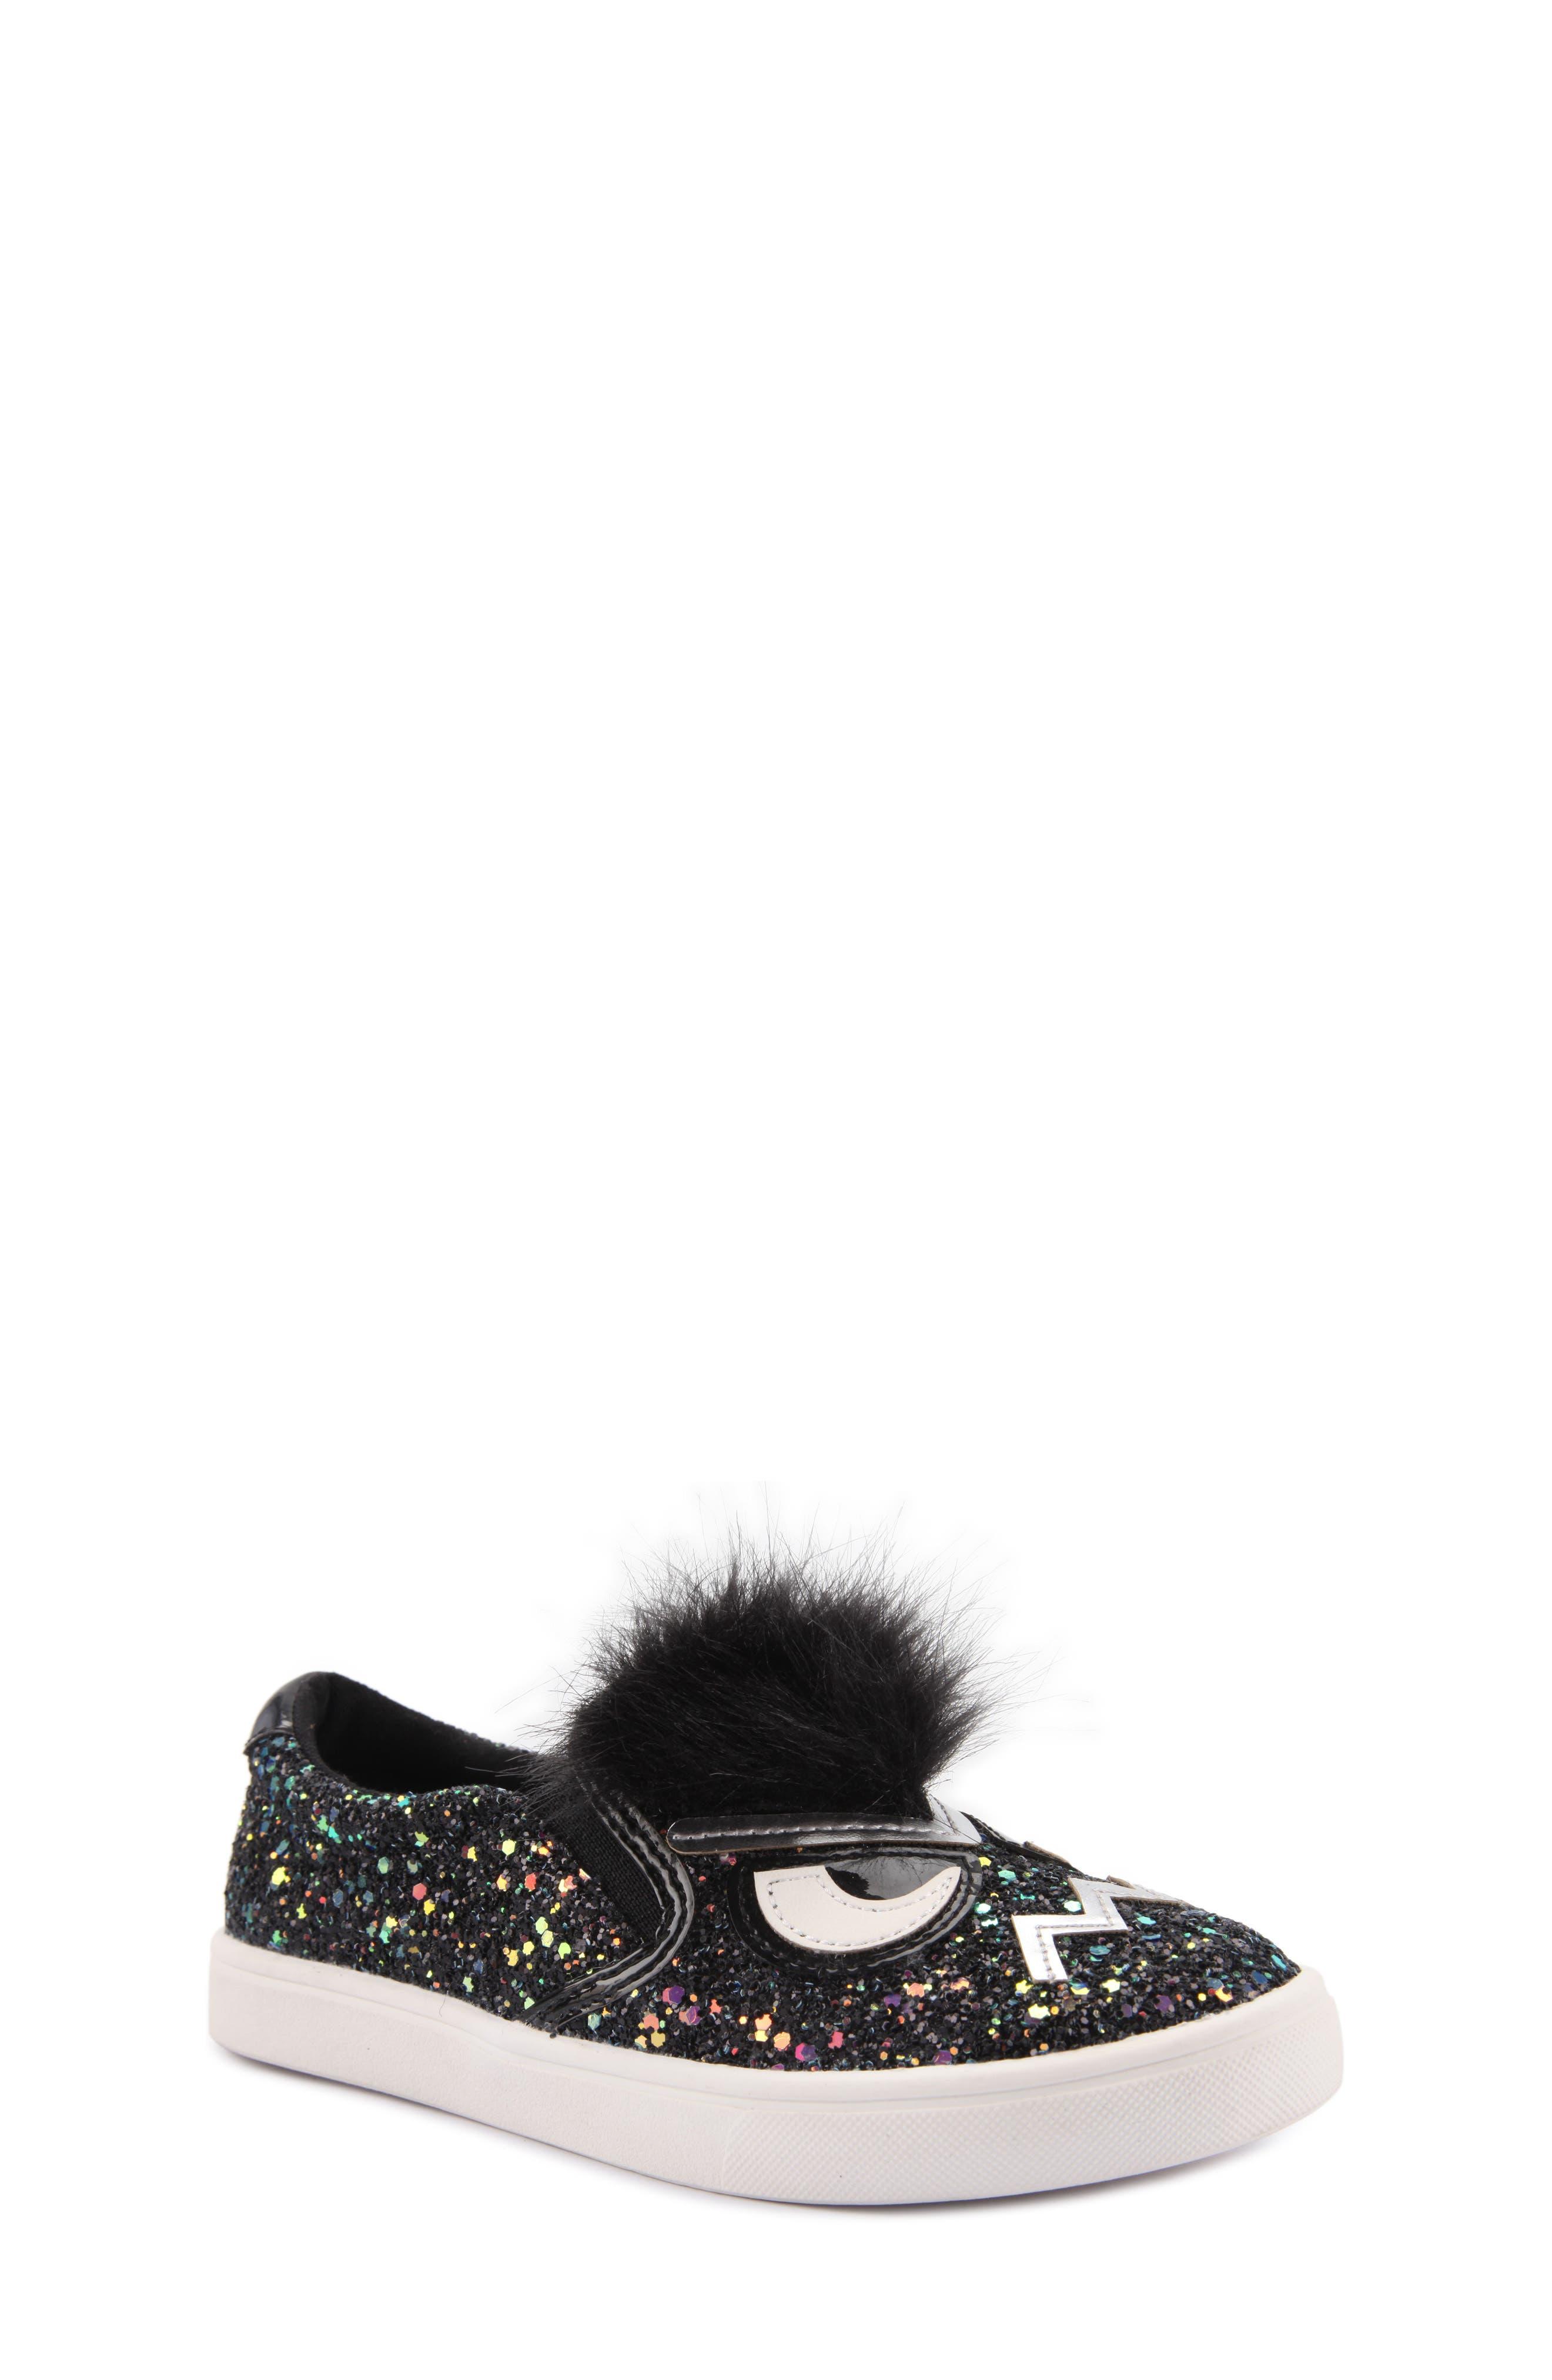 Alyx Faux Fur Glittery Slip-On Sneaker,                             Main thumbnail 1, color,                             008